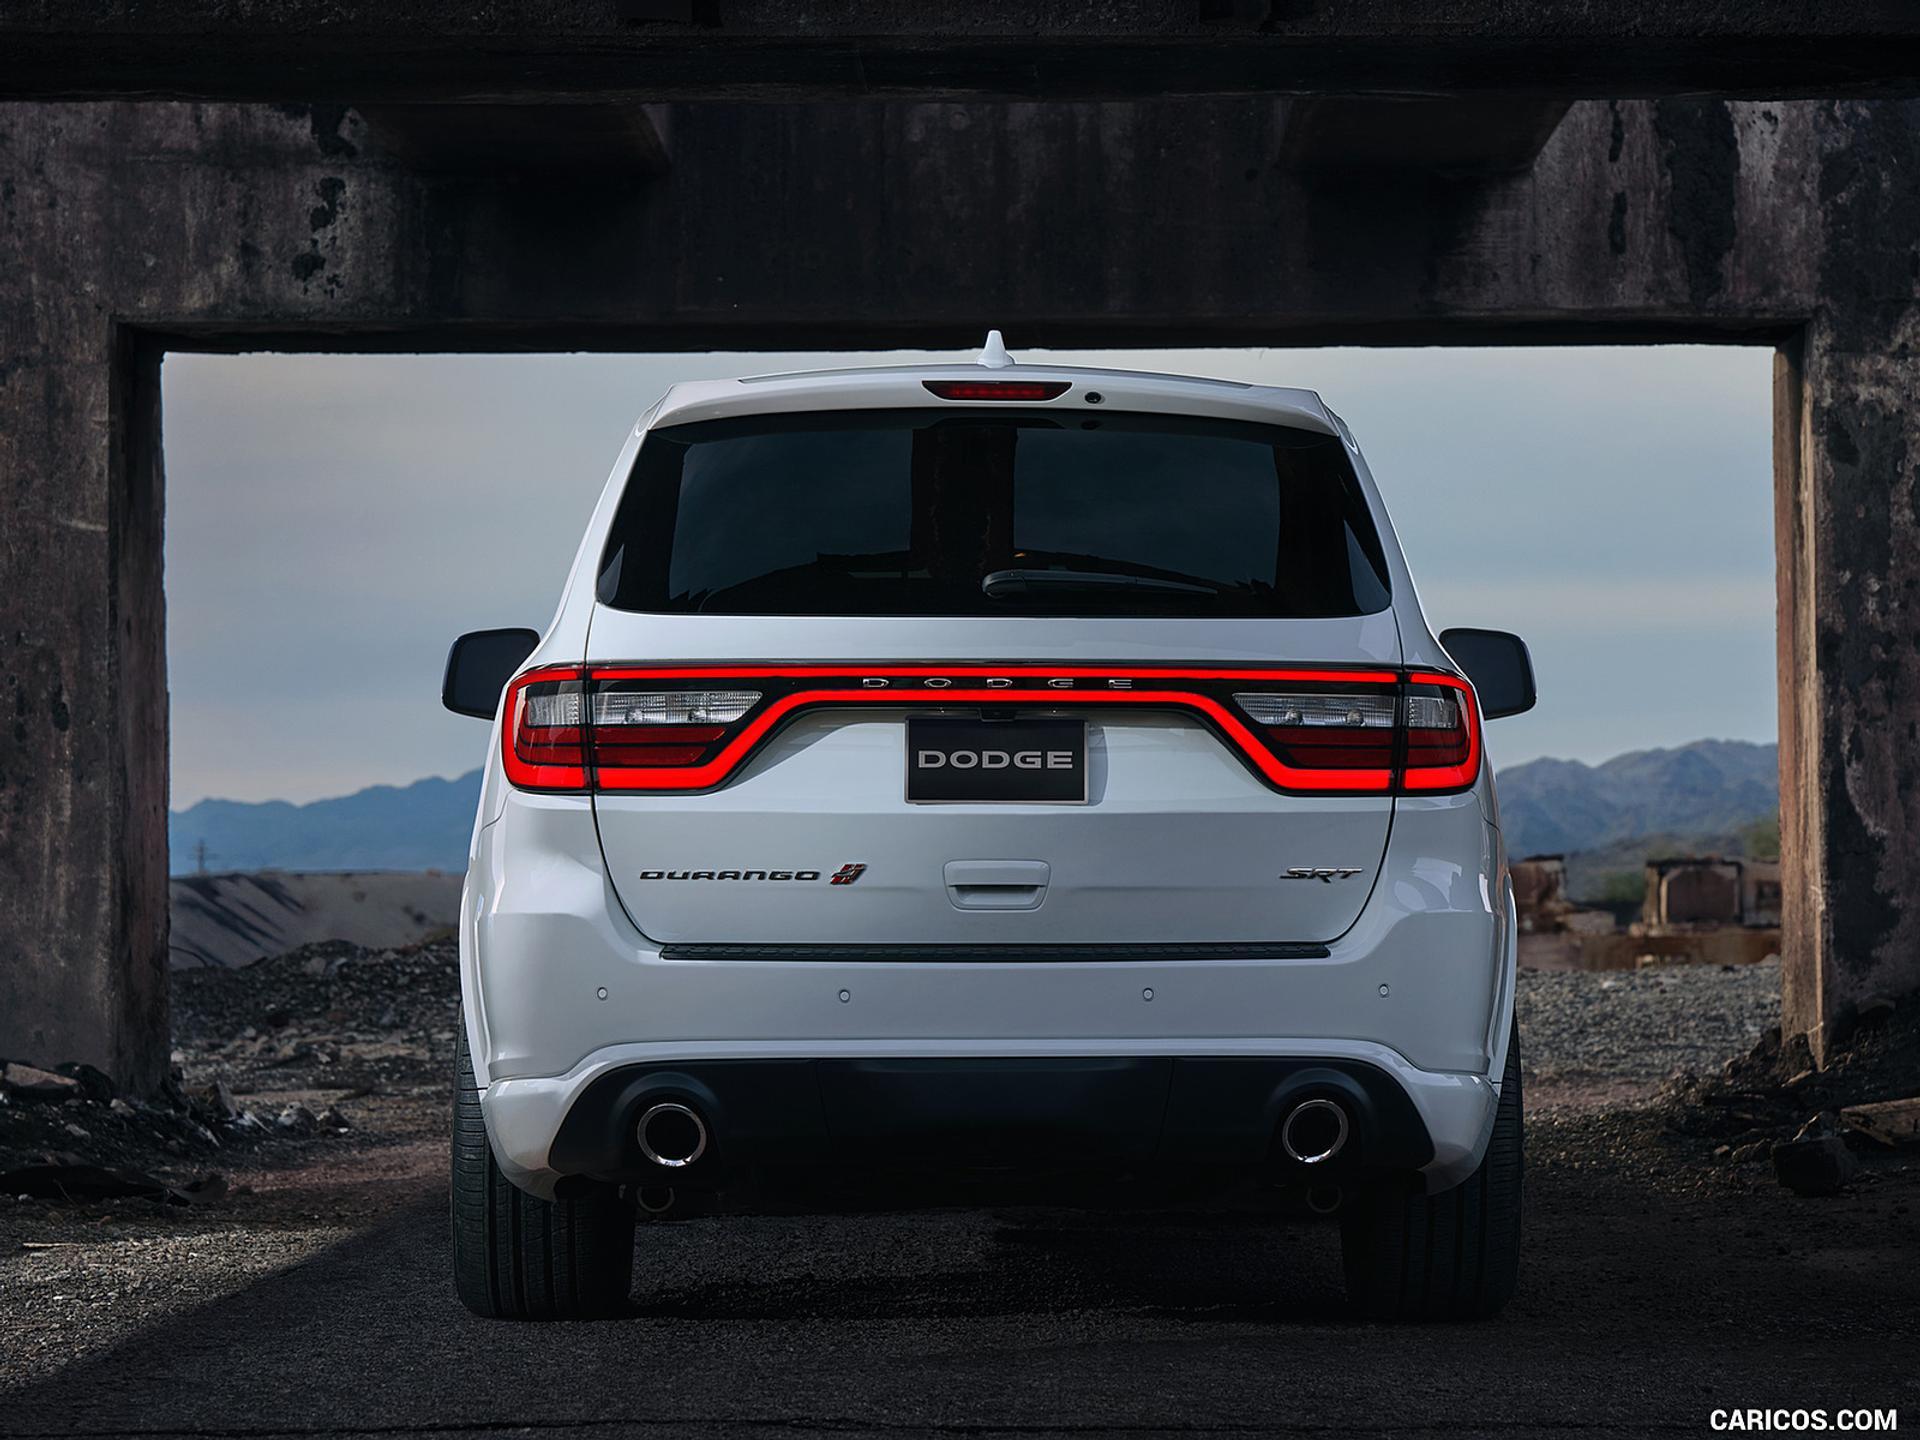 Dodge Durango rear view